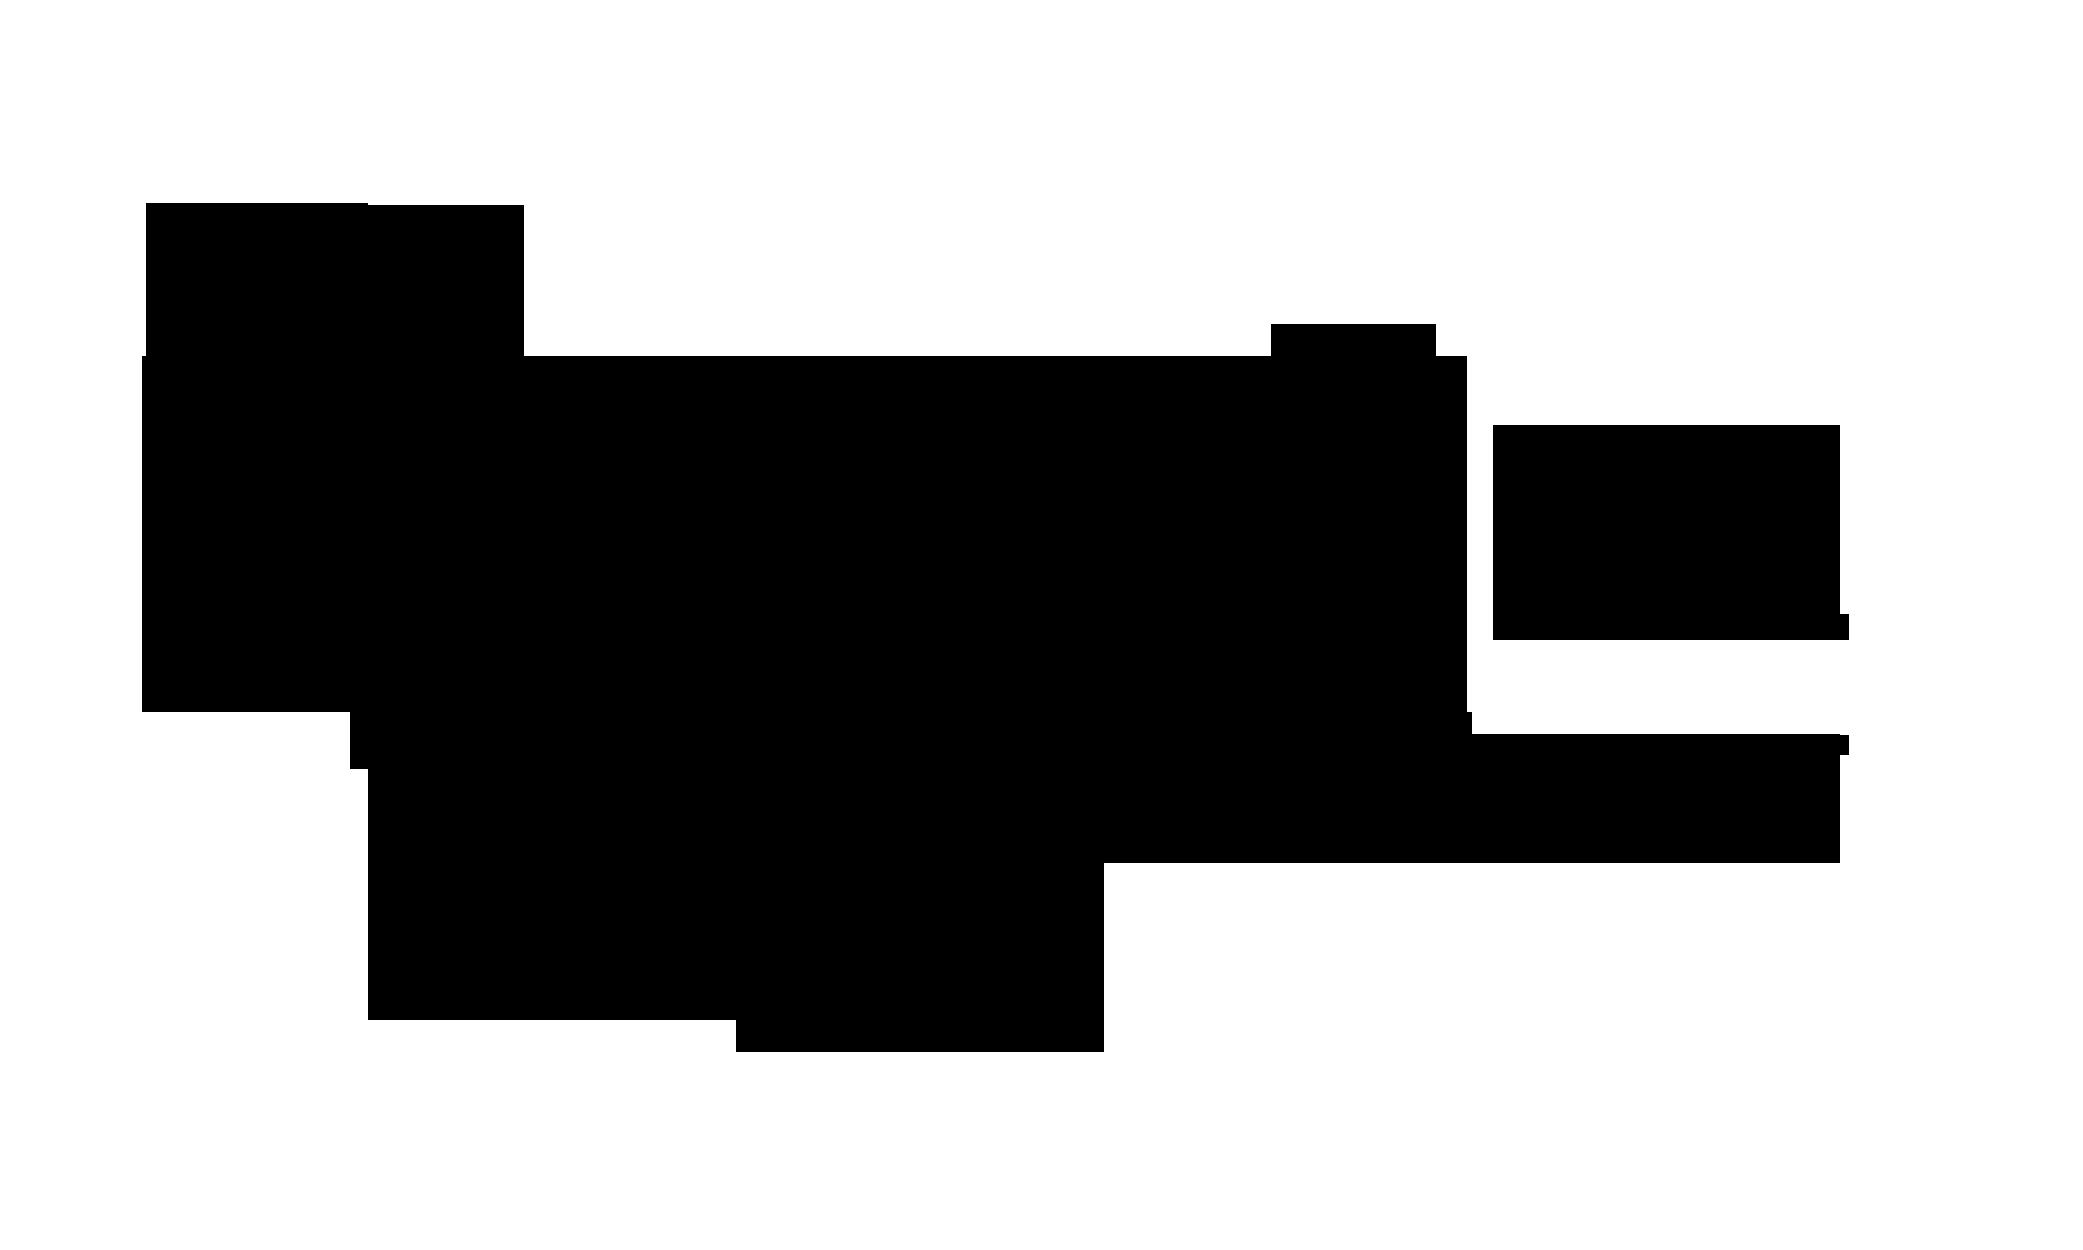 bfi_ff_mono_logo_landscape_pos_2